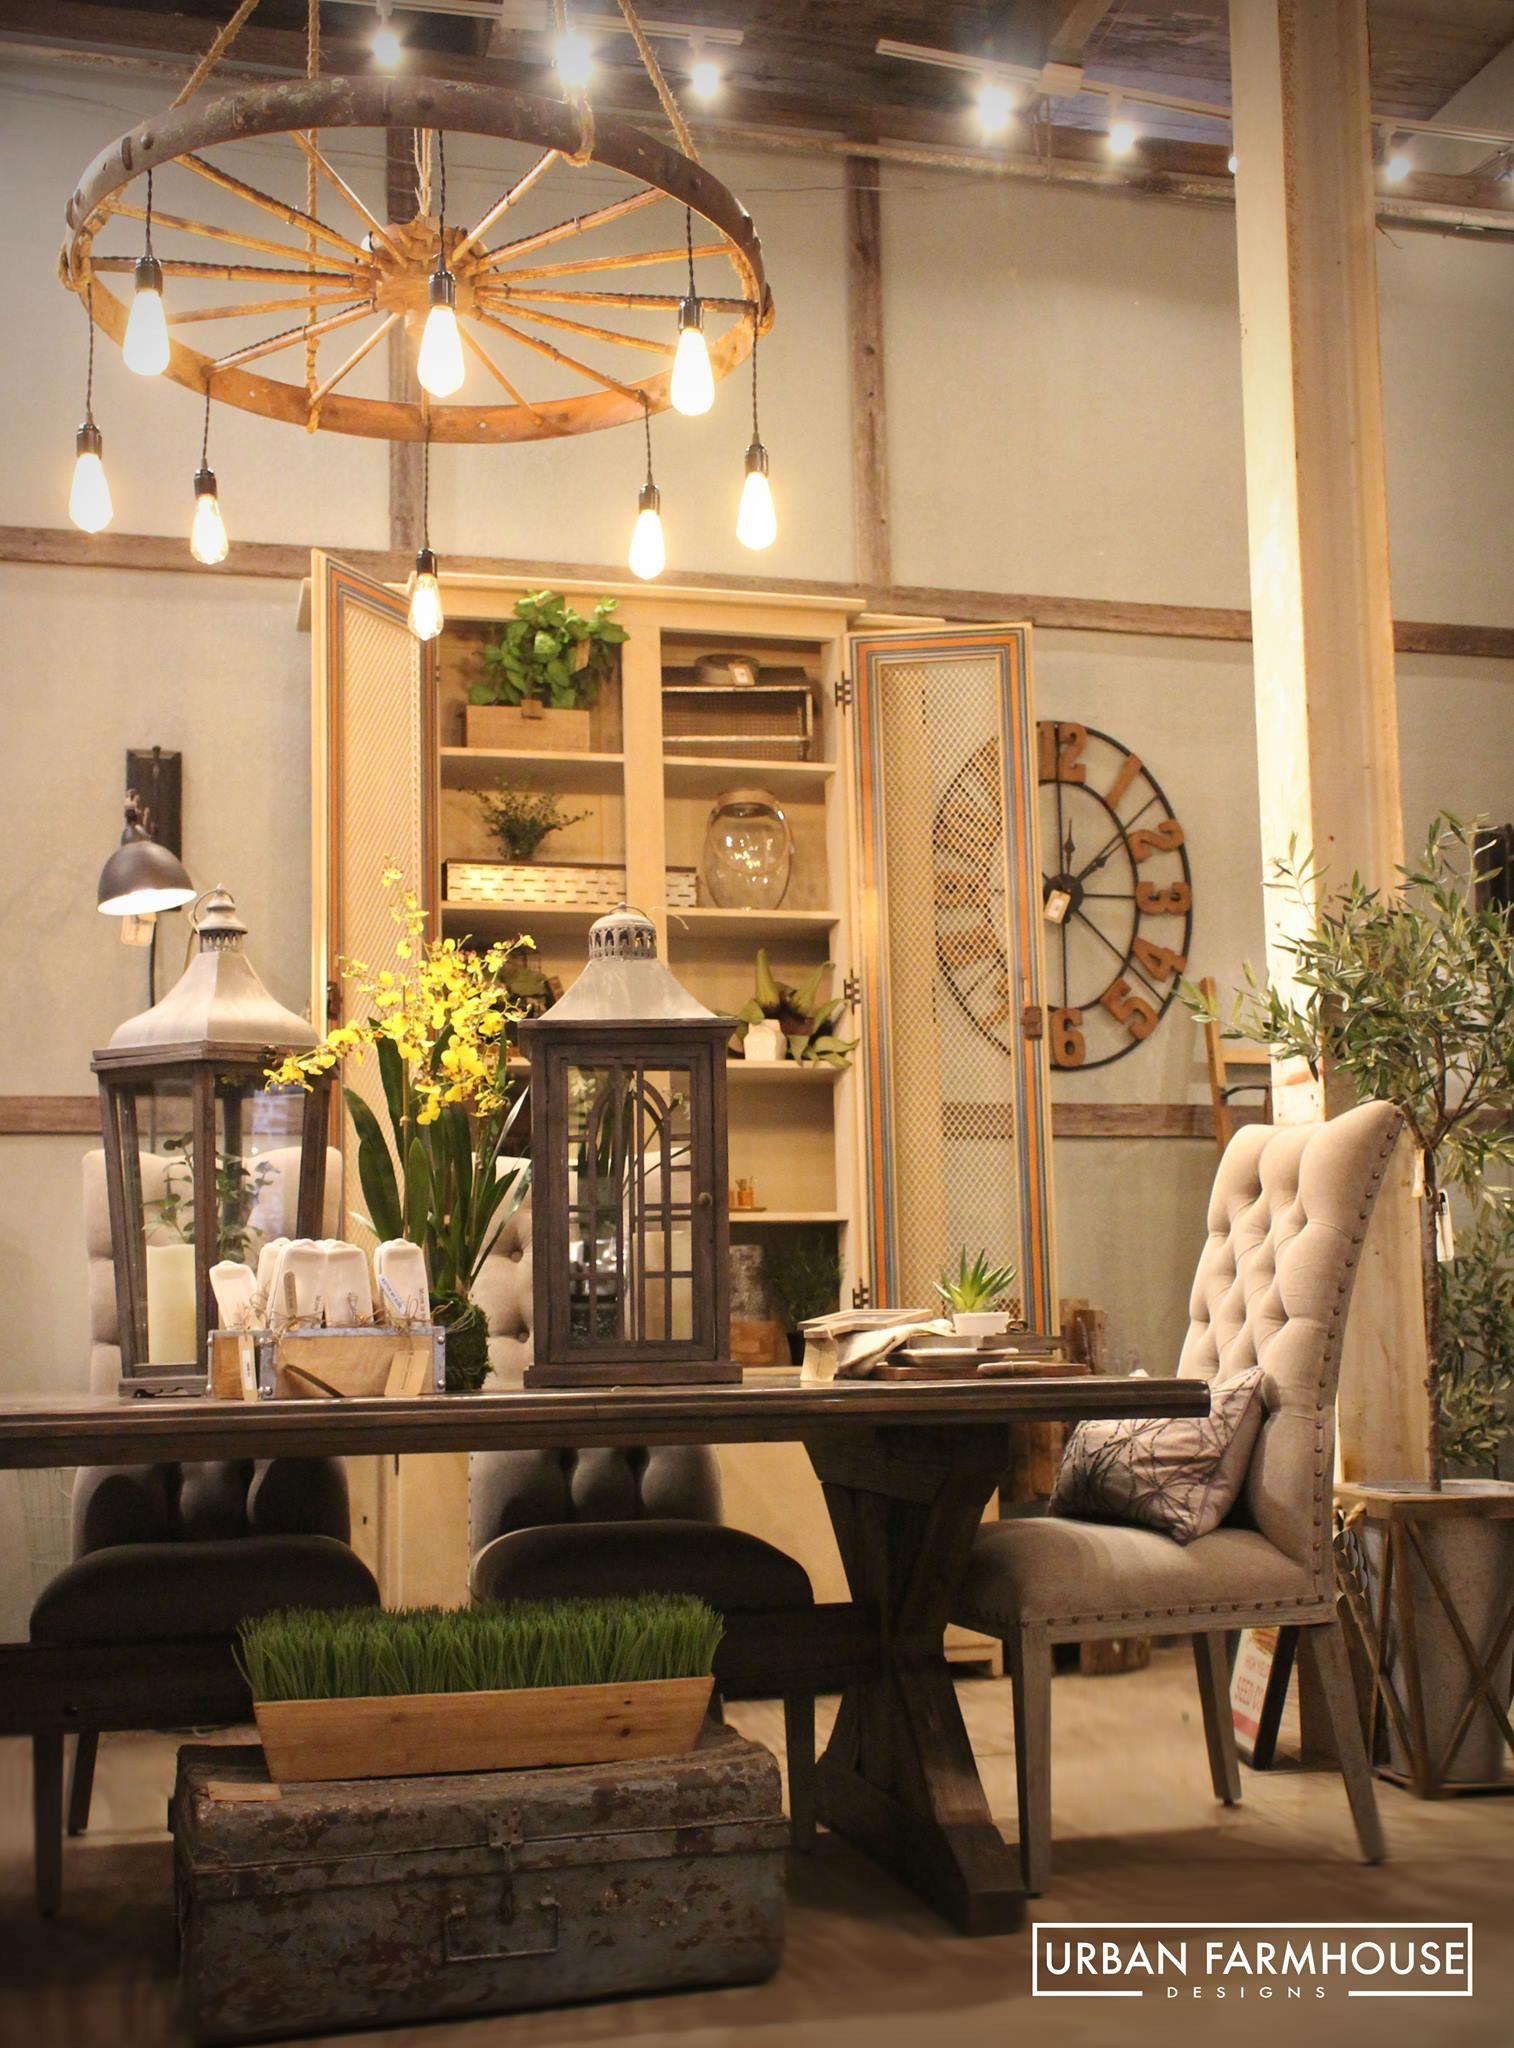 Urban Farmhouse Designs Beautiful Staging Industrial Living Room Design Rustic Industrial Living Room Farmhouse Decor Living Room